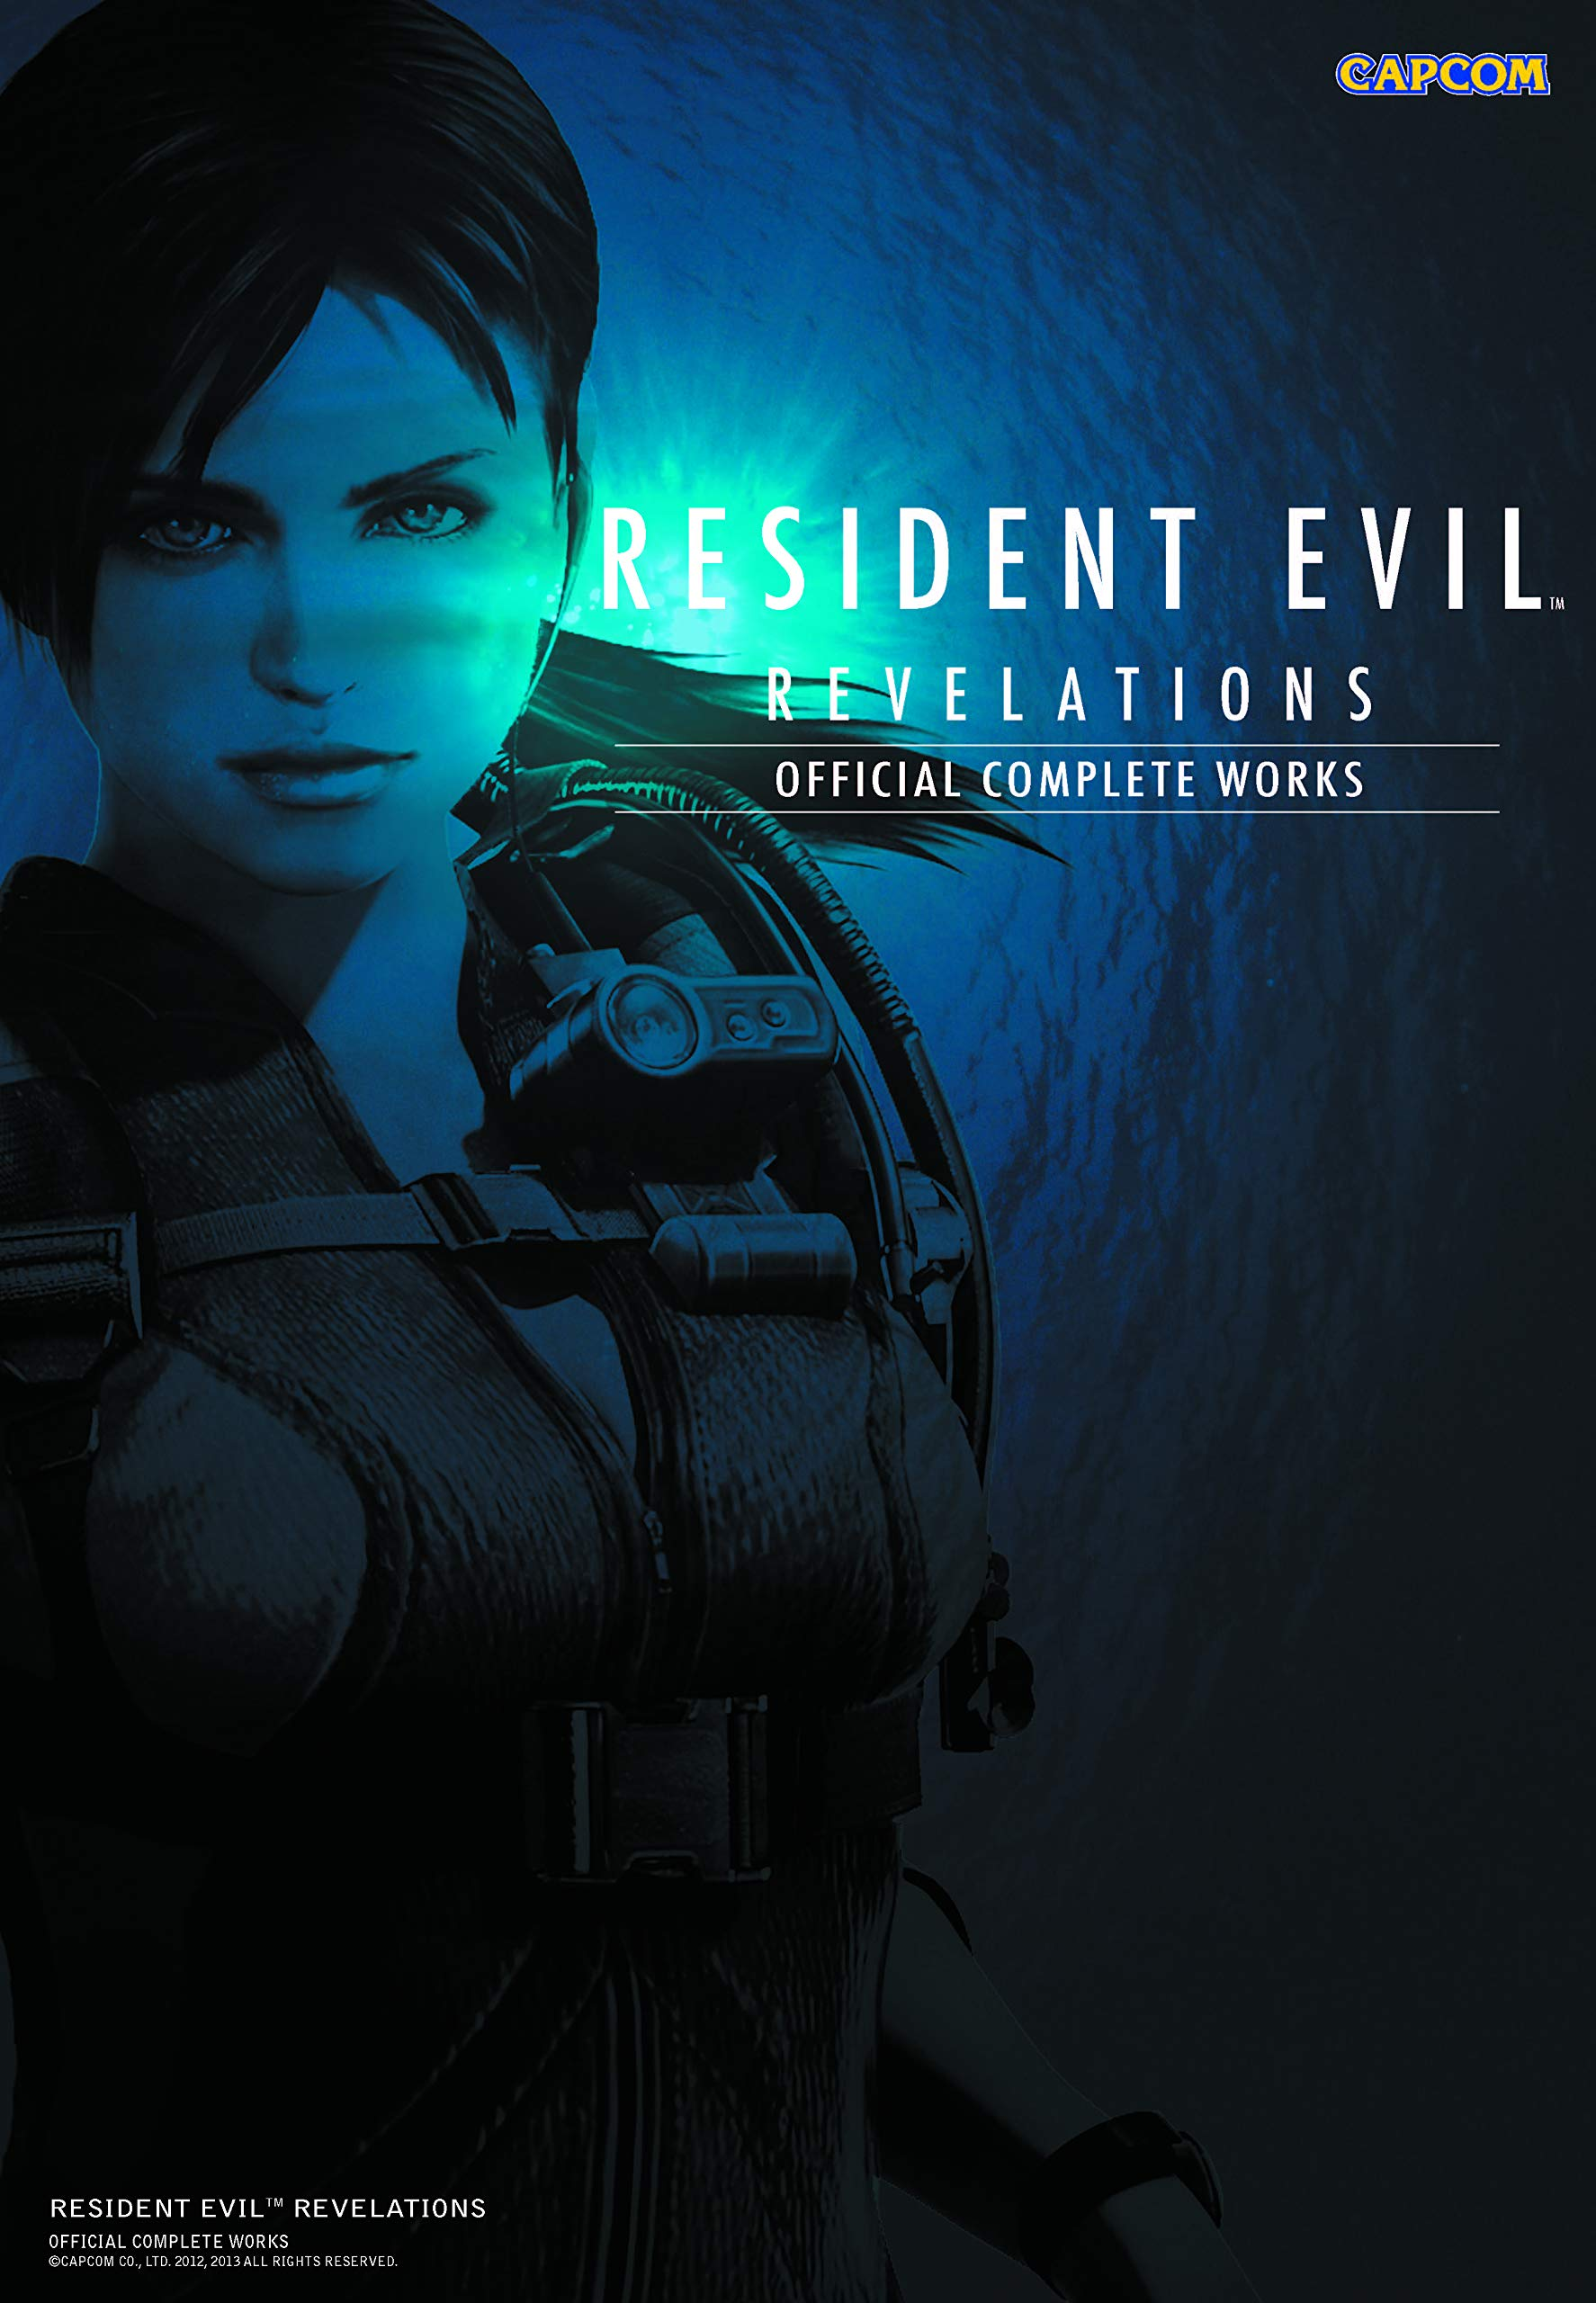 Resident Evil Revelations: Official Complete Works: Amazon.es ...